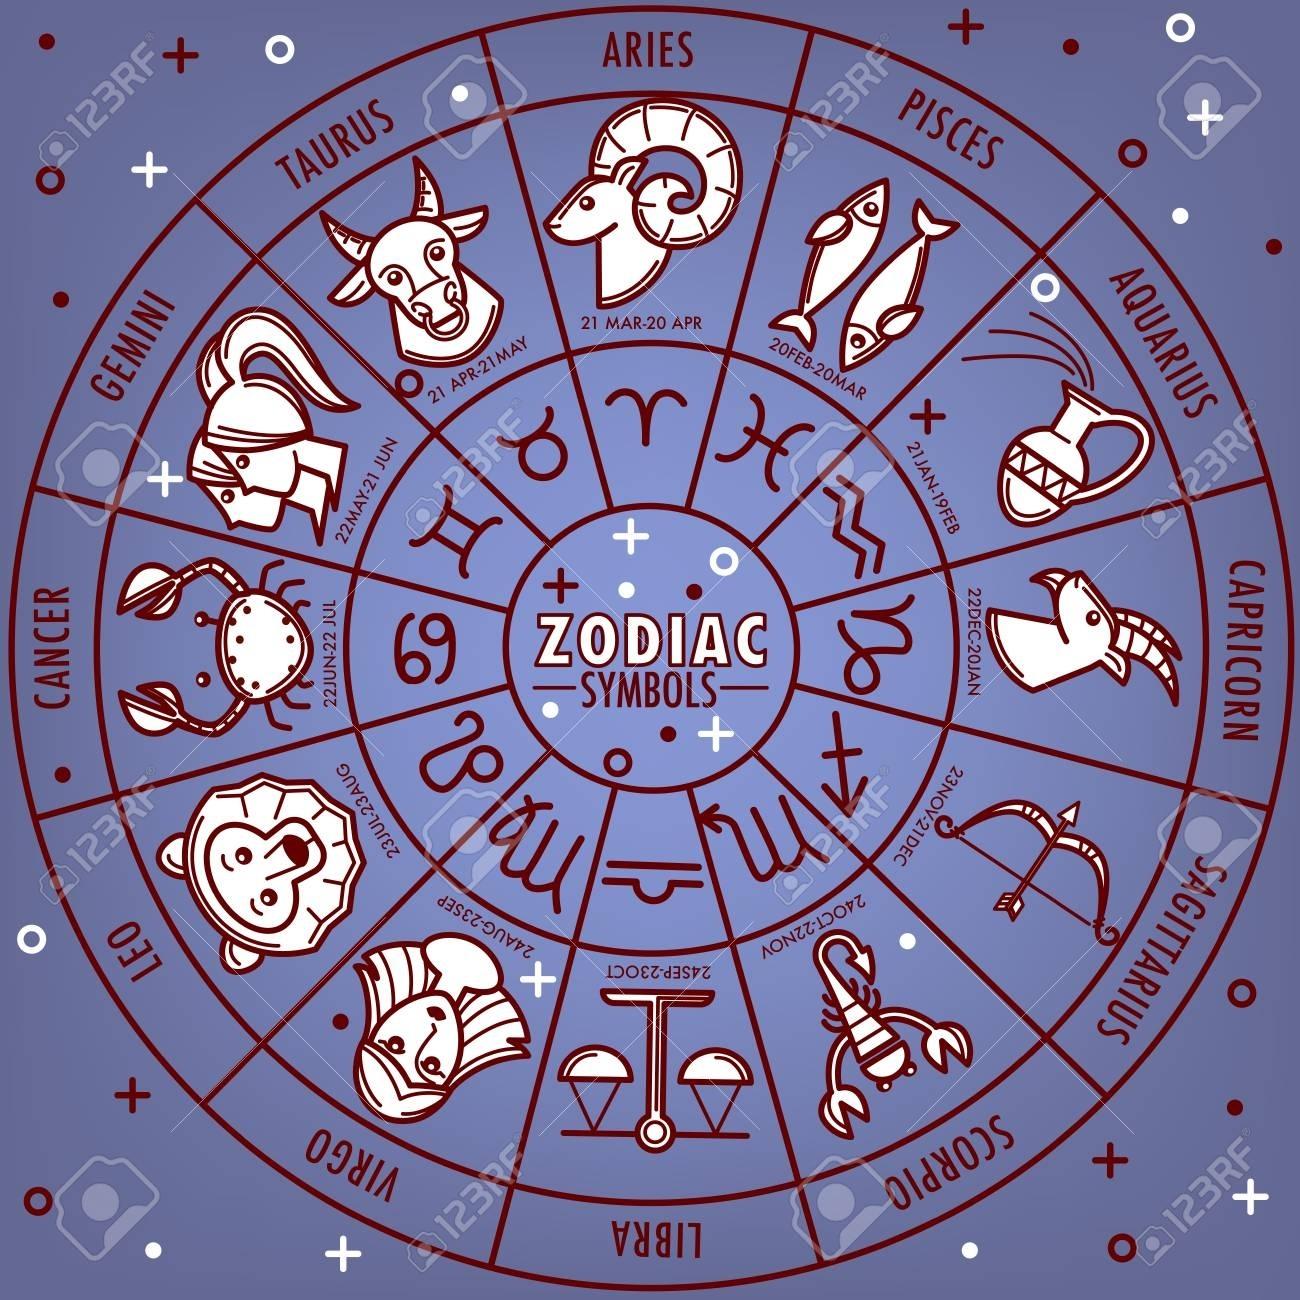 Zodiac Horoscope Signs With Birth Dates On Zodiac Circle Wheel Zodiac Calendar Signs Dates